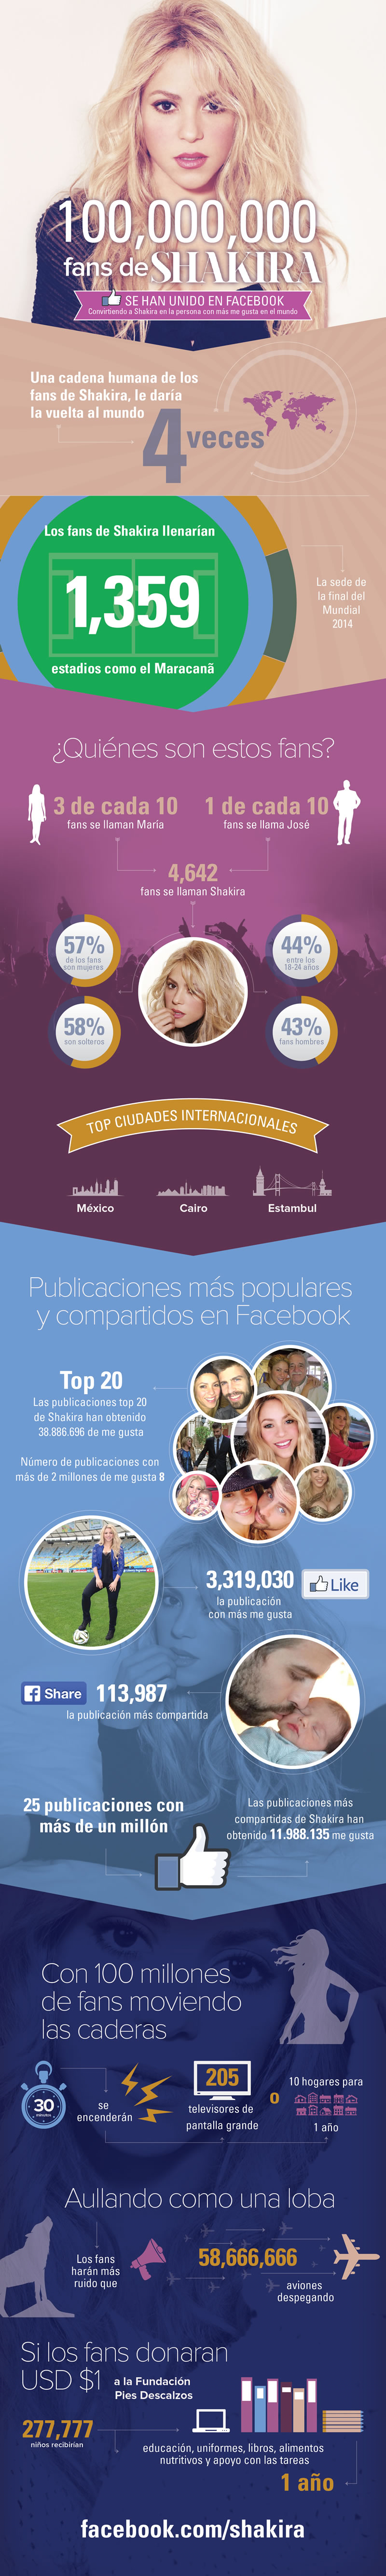 Shakira, se convirtió en la celebridad con más likes en Facebook - infografia-shakira-100-millones-de-likes